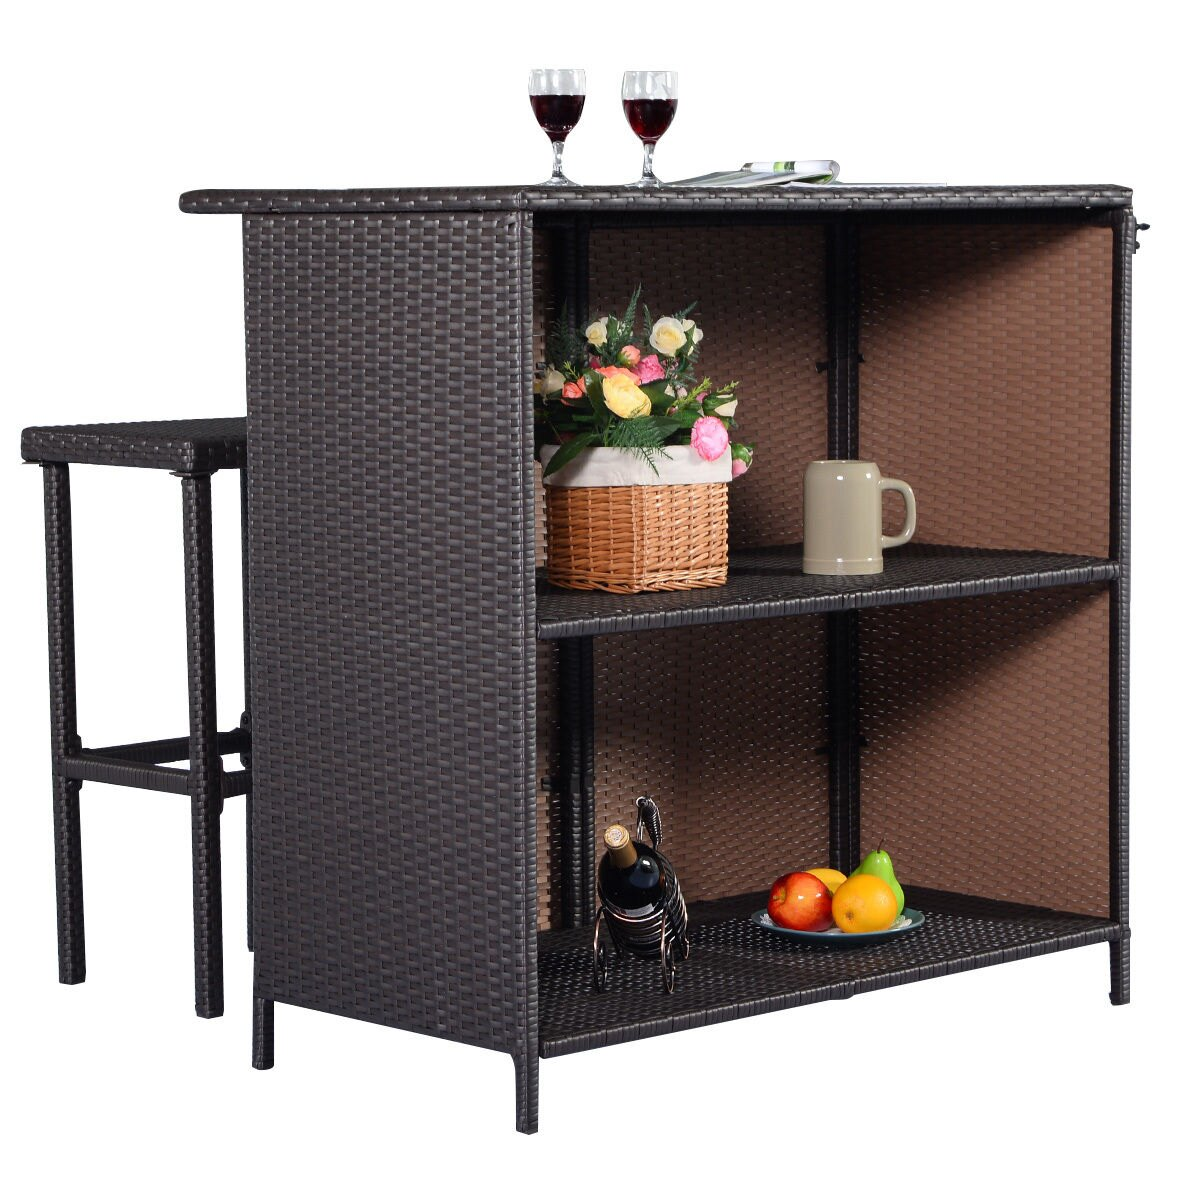 Costway 3PCS Rattan Wicker Bar Set Patio Outdoor Table & 2 Stools Furniture Brown 5